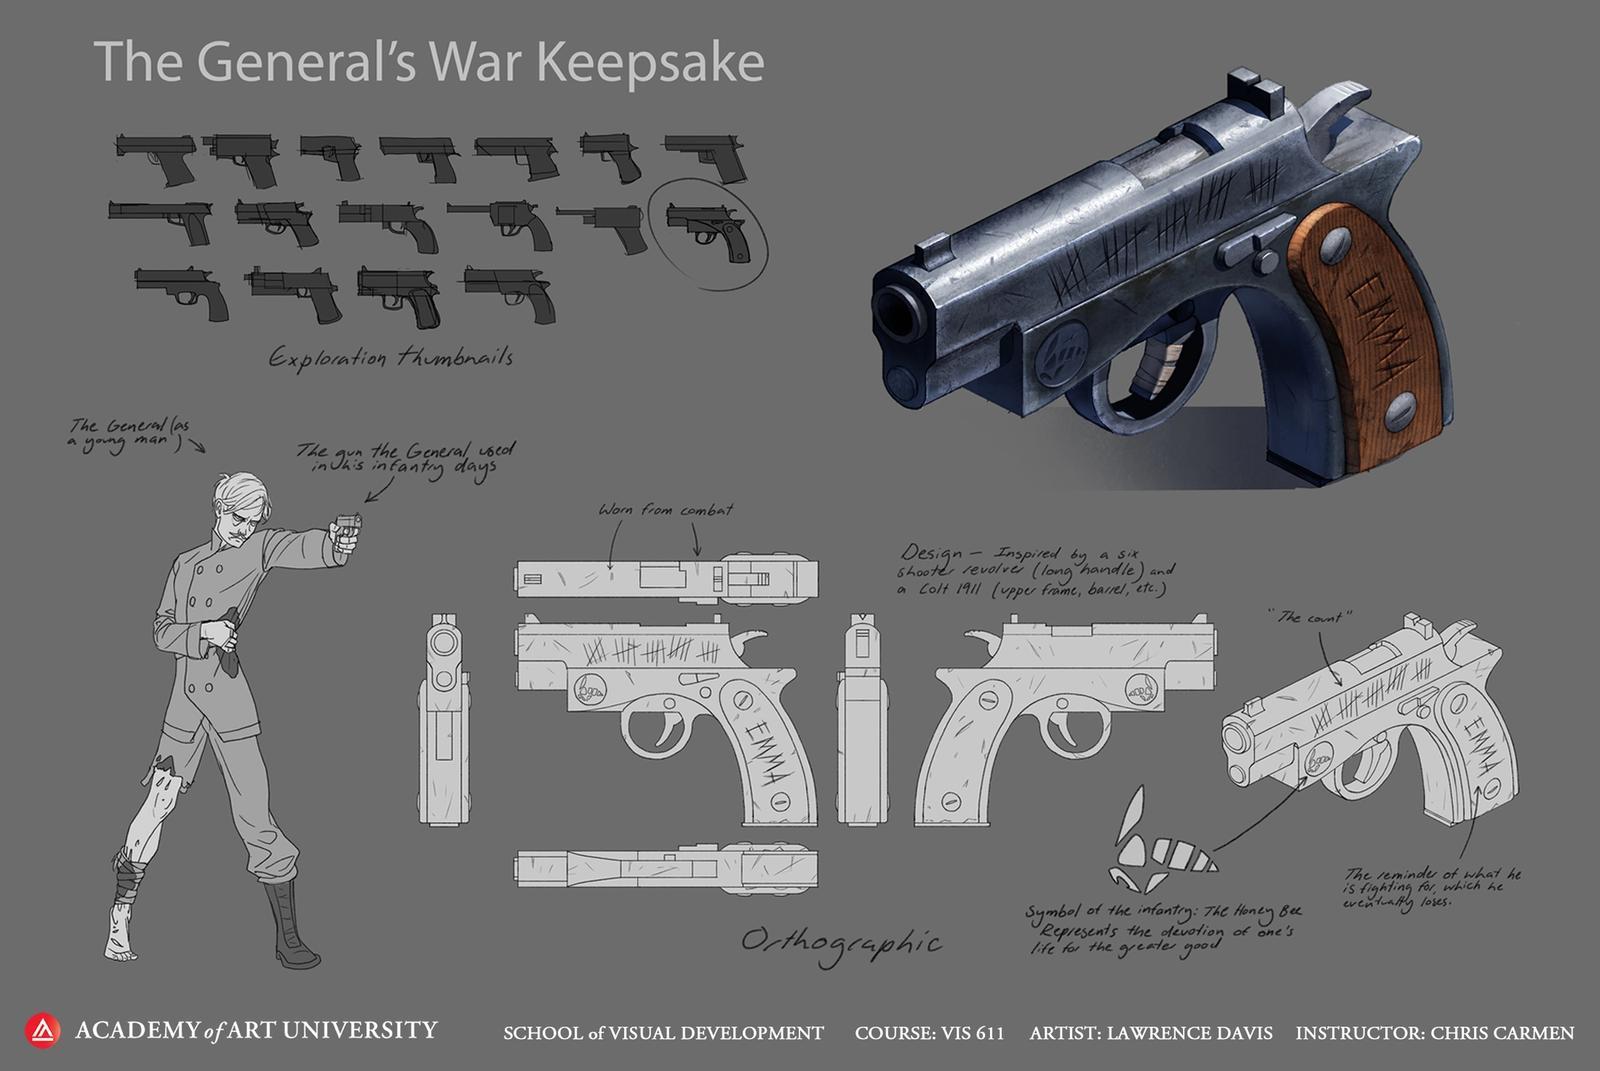 The General's War Keepsake